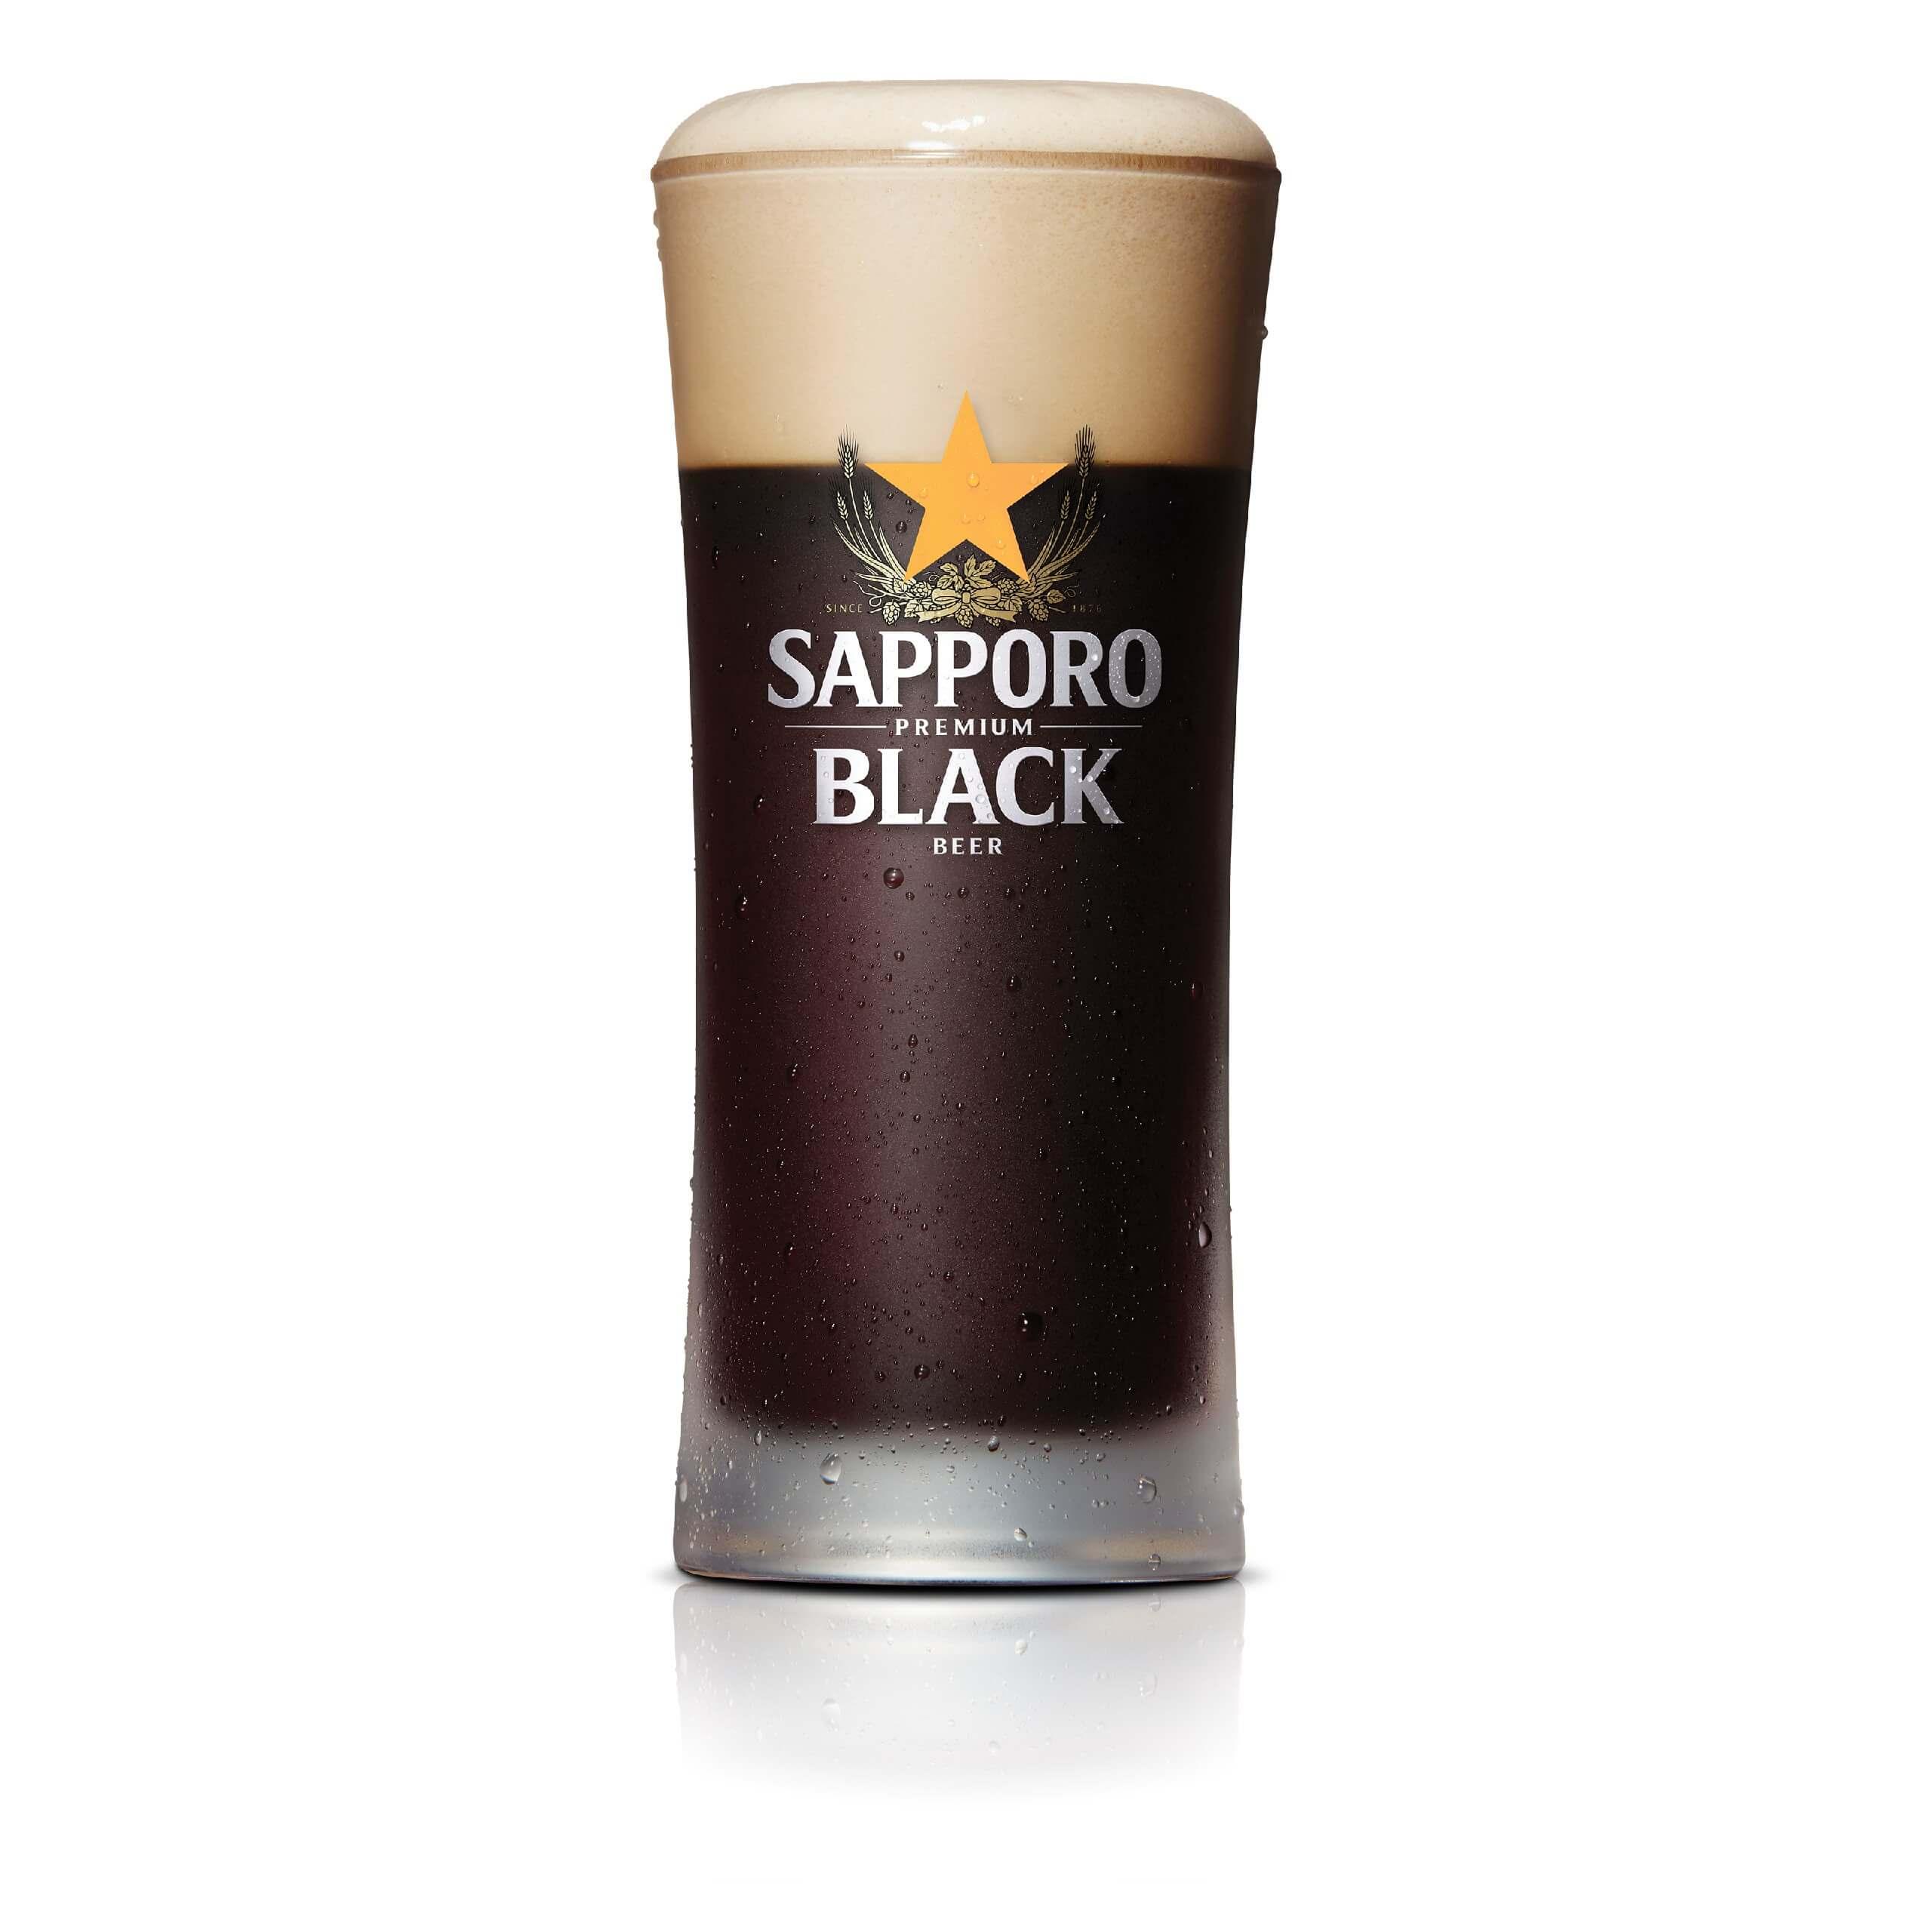 Sapporo Premium Draft Black Beer Keg 20 litres